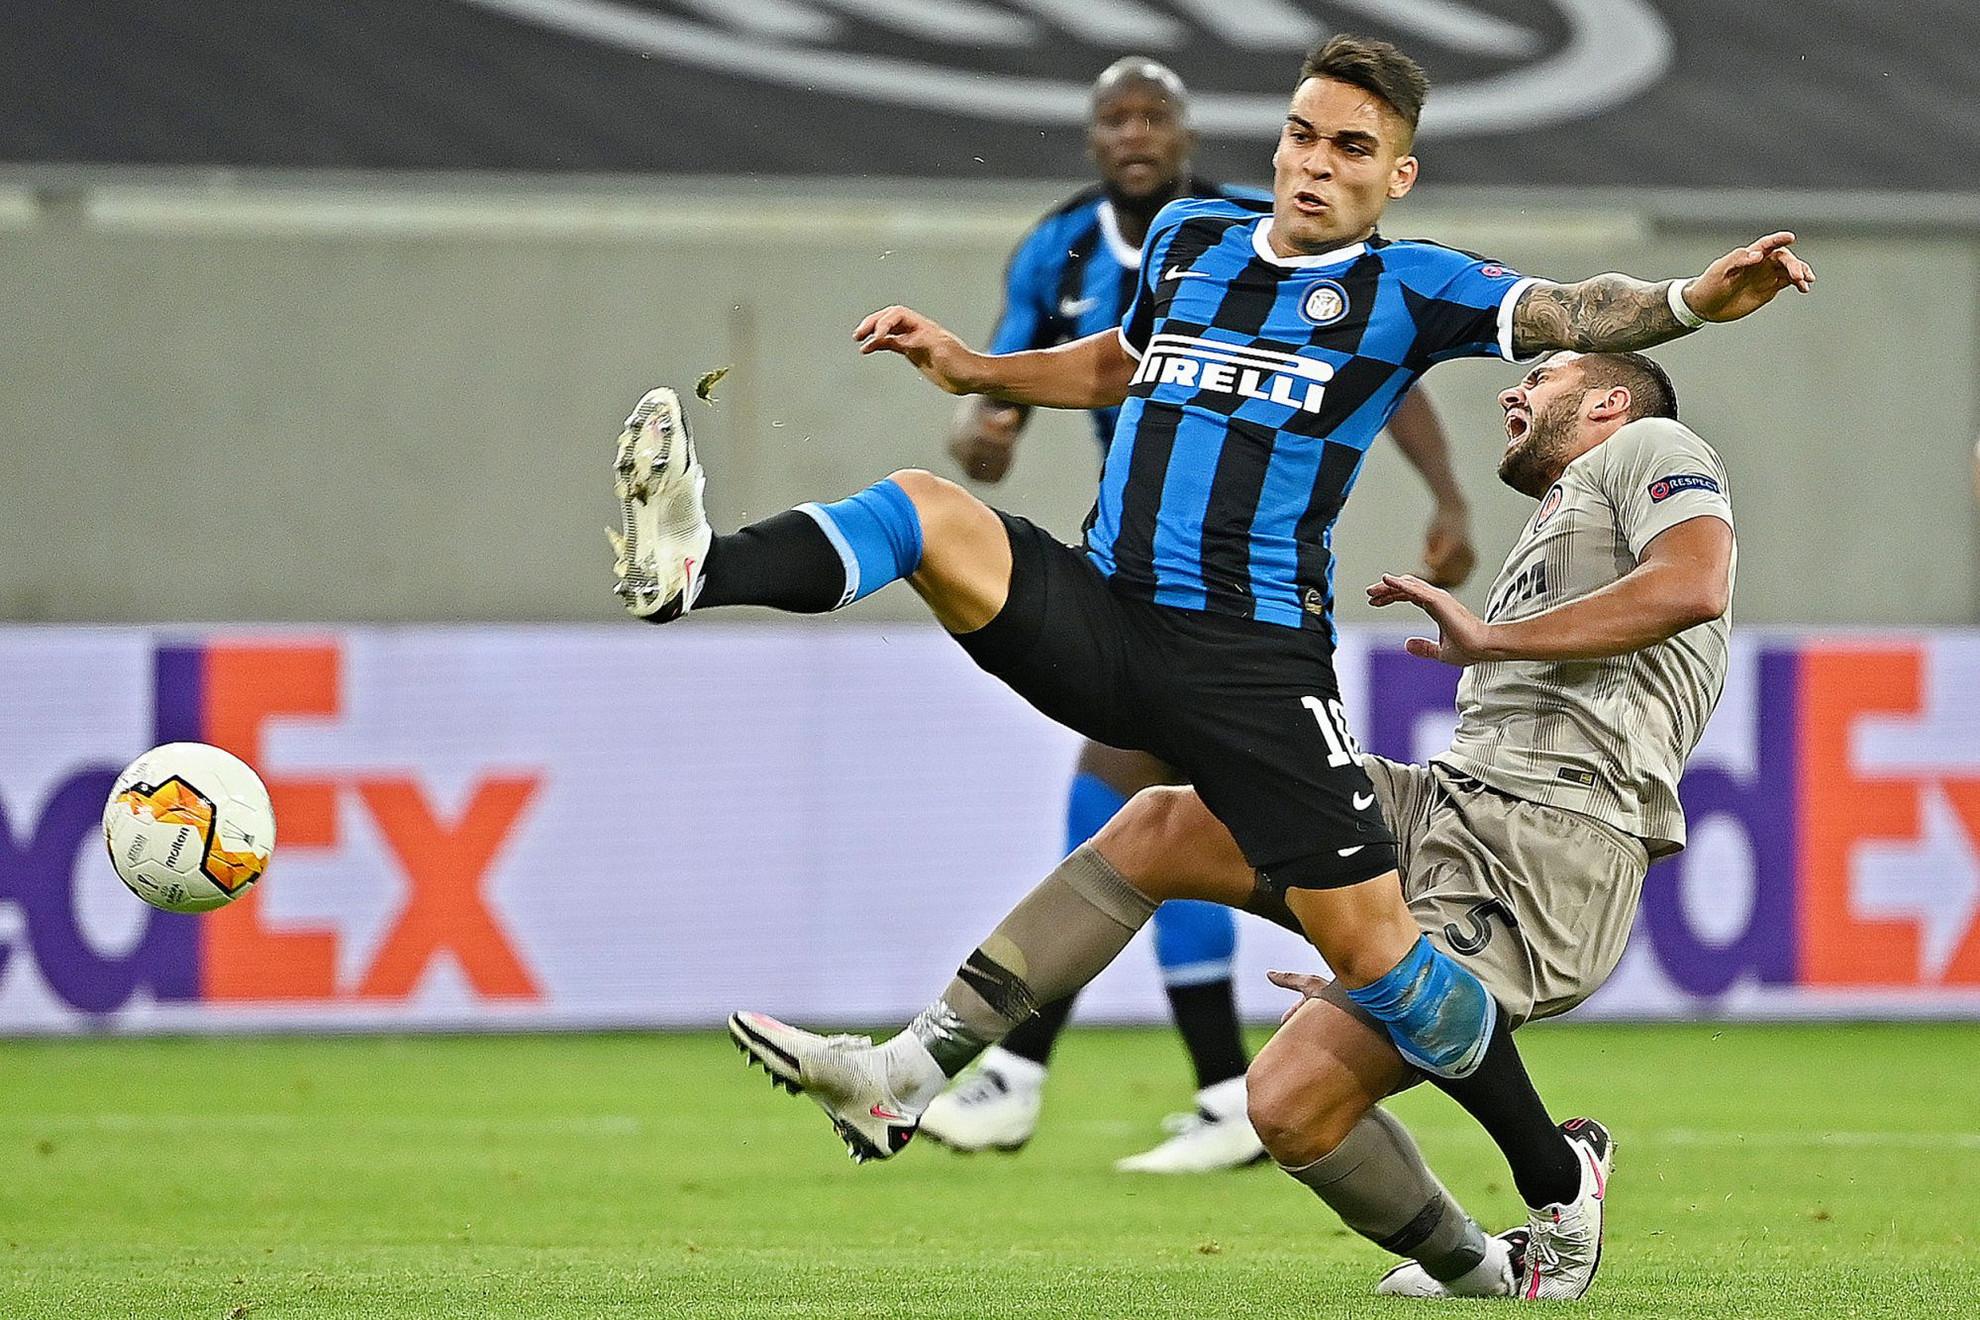 Az Internazionale Arrigo Sacchi Milanját idézte